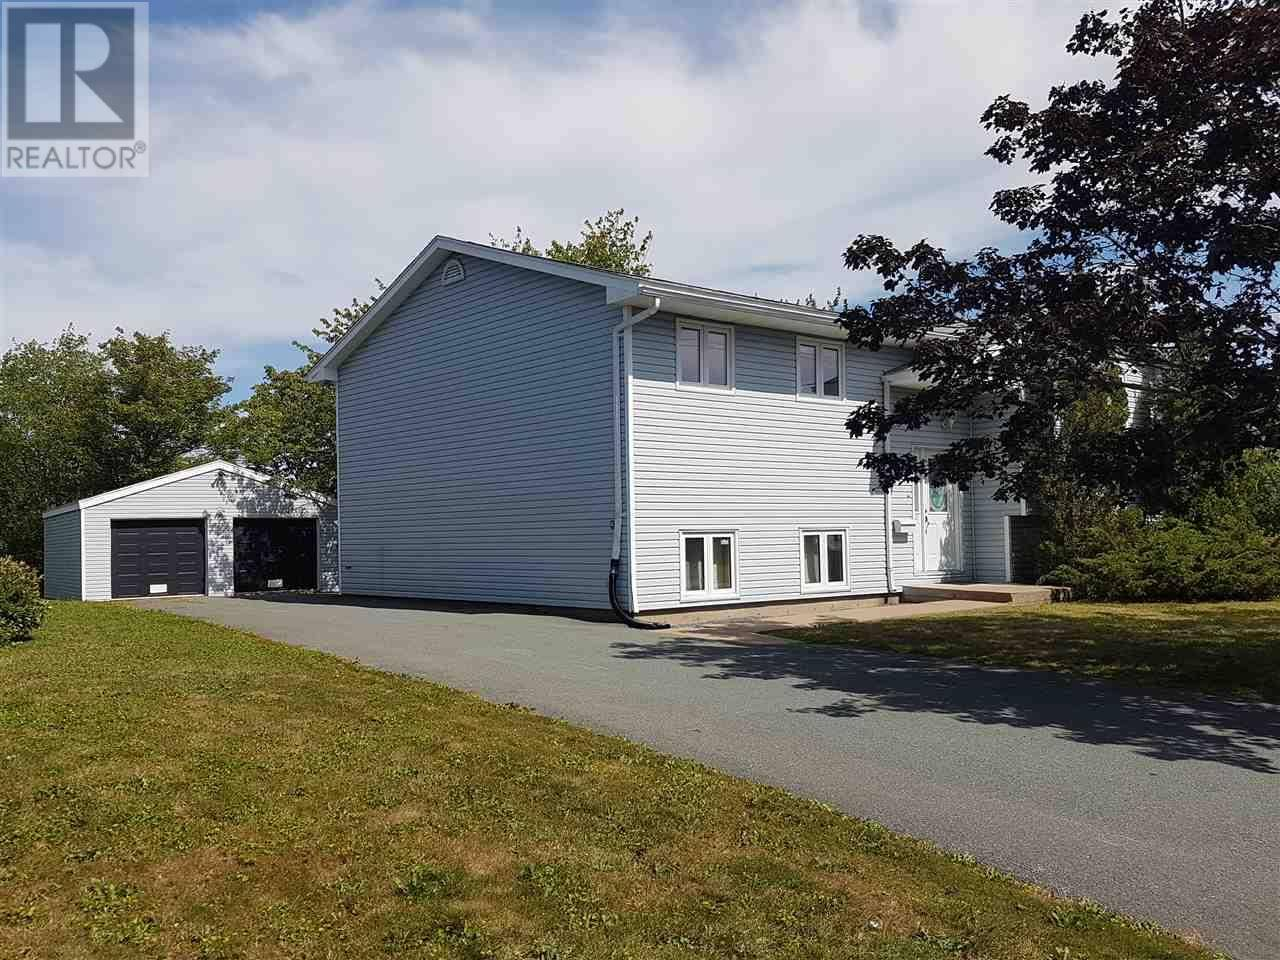 House for sale at 93 Lapierre Cres Dartmouth Nova Scotia - MLS: 201920350